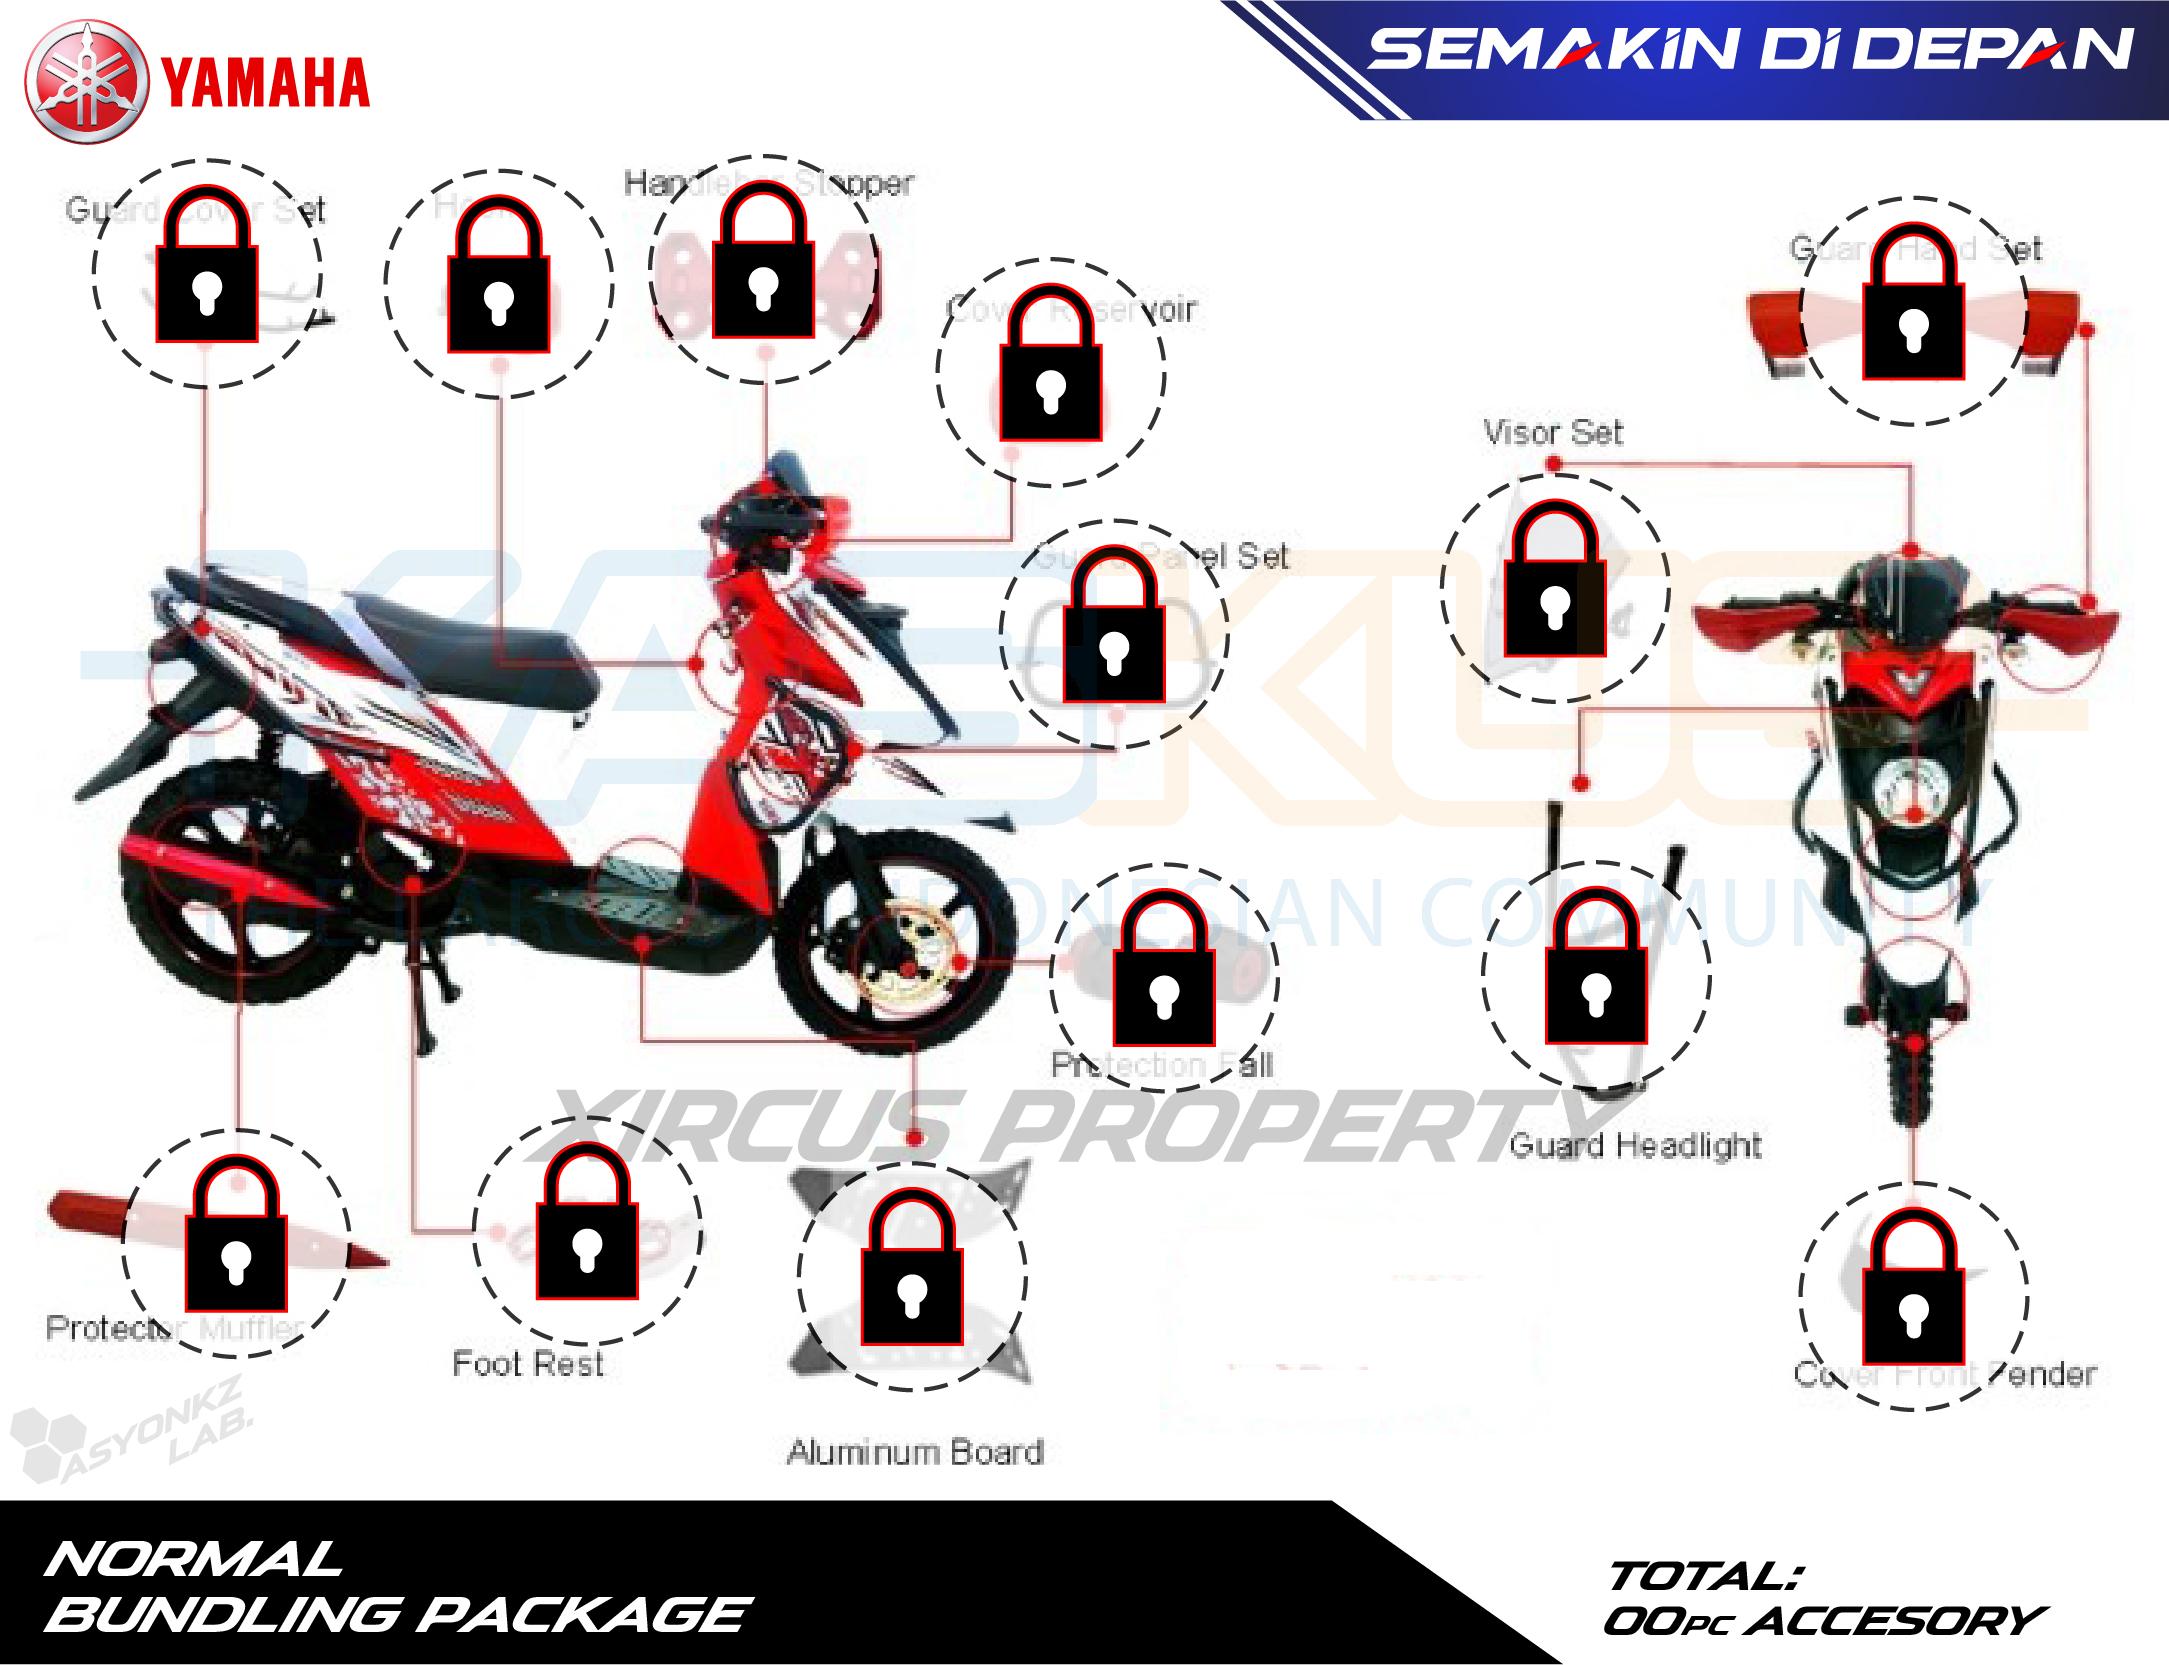 Serba serbi yamaha x ride kaskus altavistaventures Choice Image